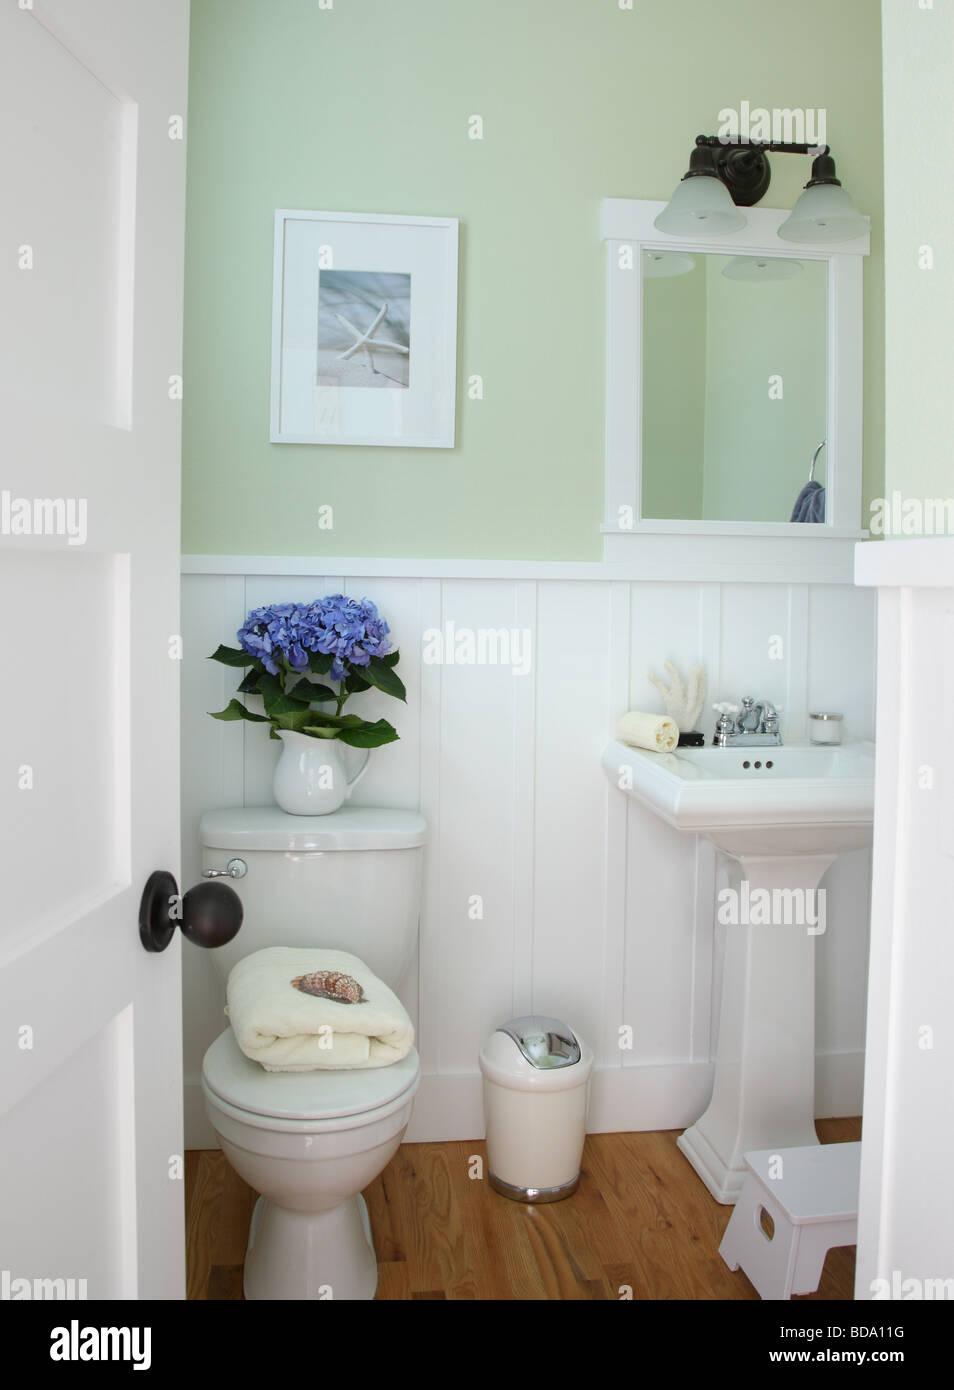 Bathroom home interior - Stock Image